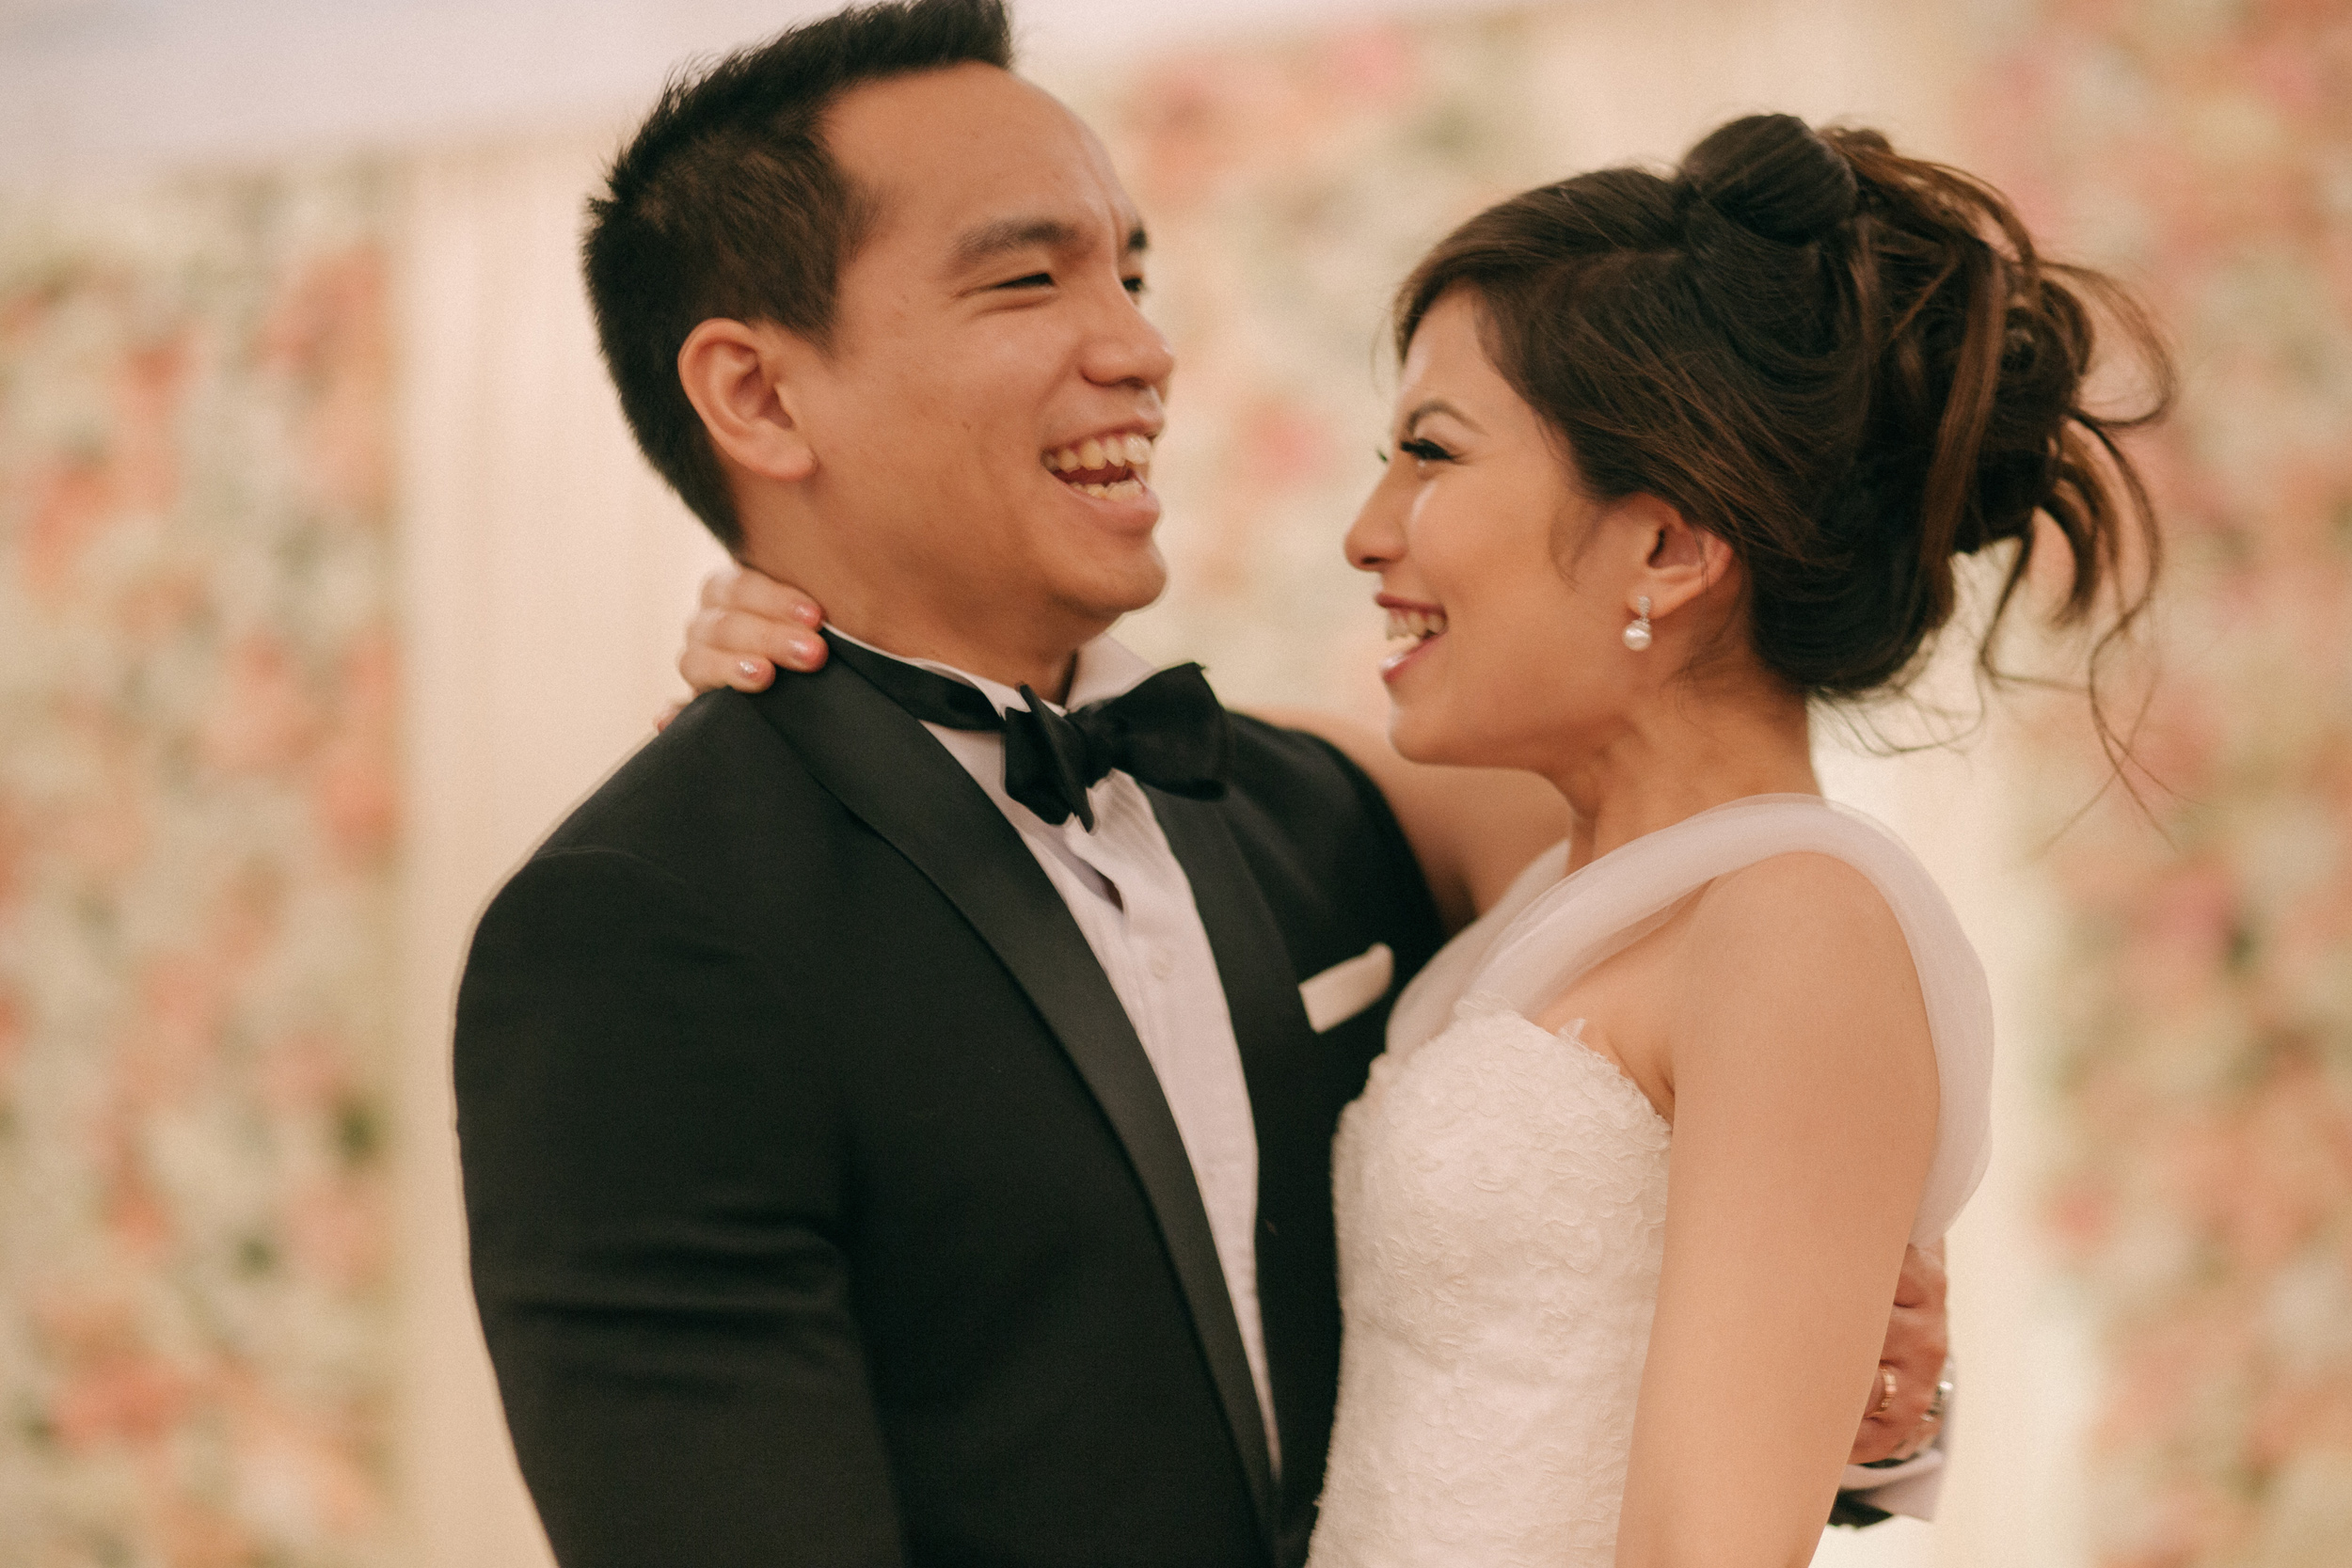 singapore-wedding-photographer-cheryl-matthew-fullerton-hotel-wedding-83.jpg